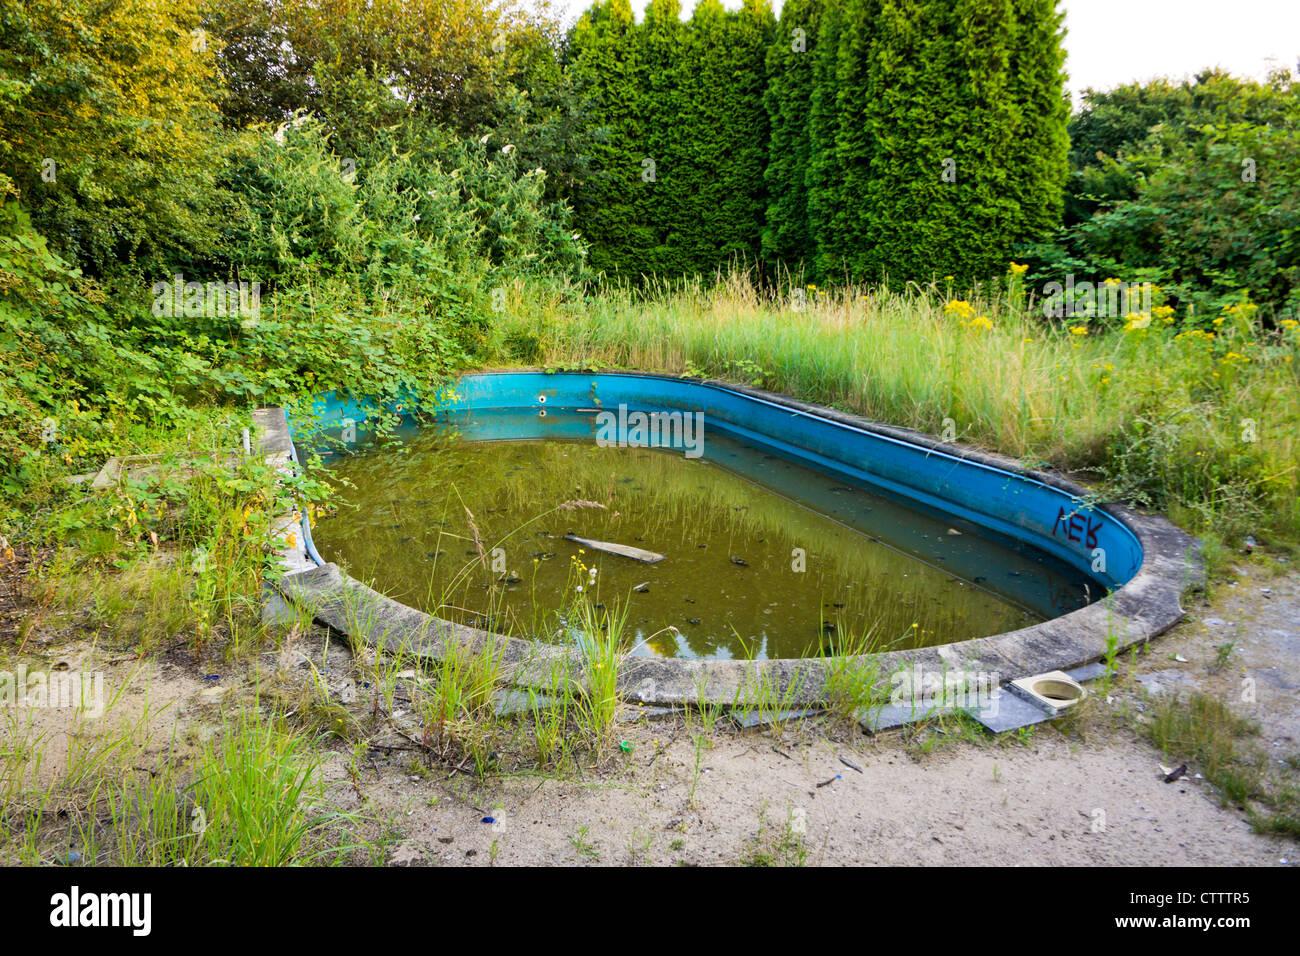 Jardin avec piscine abandonn e banque d 39 images photo for Piscine abandonnee